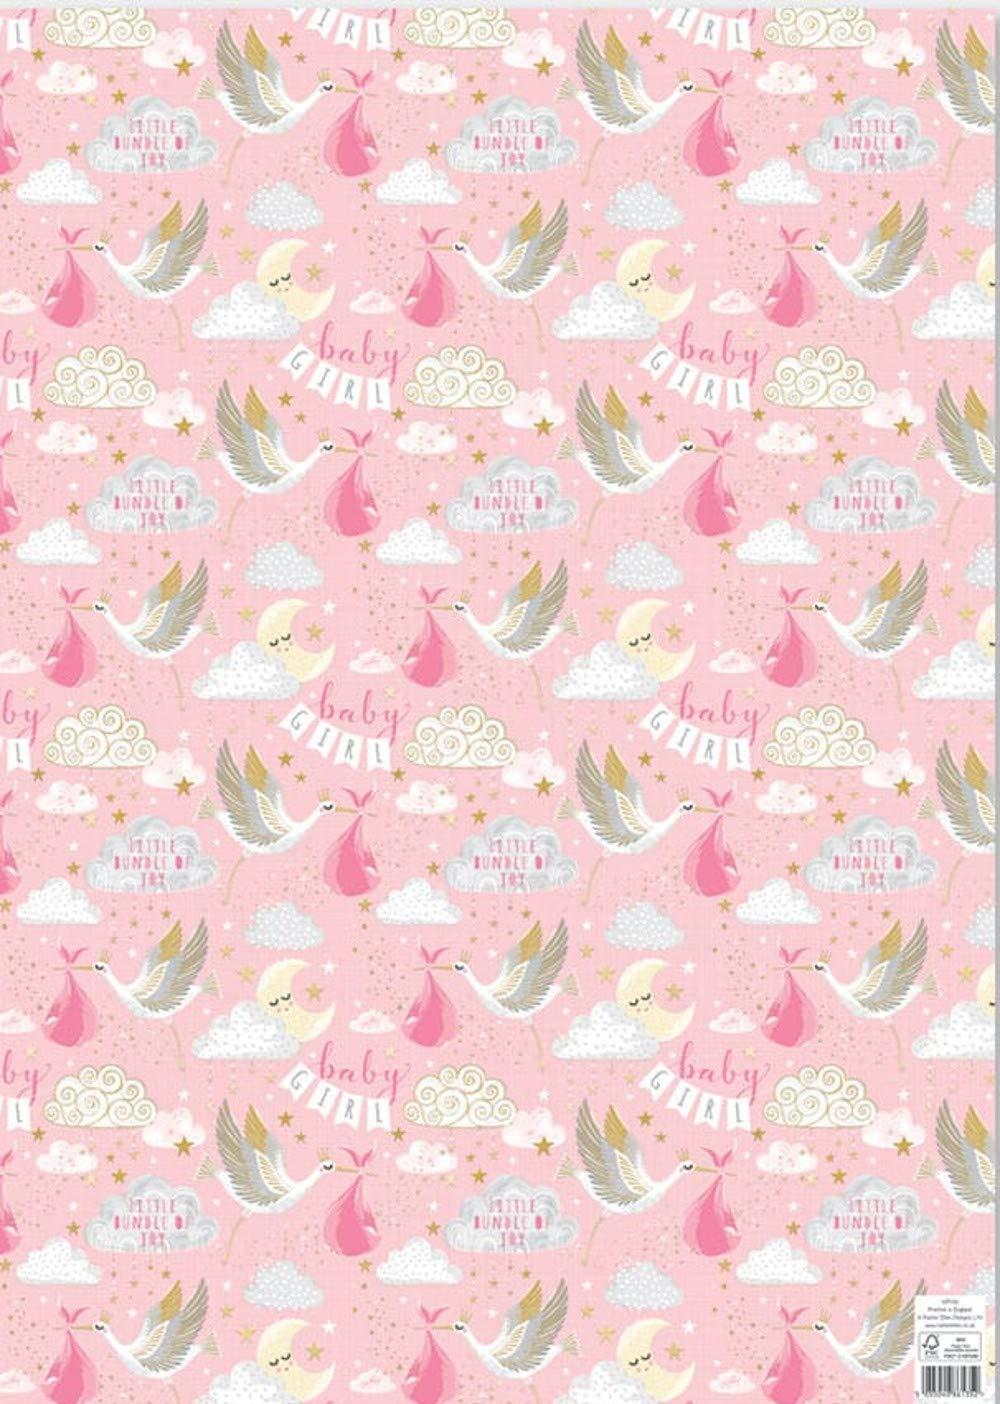 WP139 Rachel Ellen Carta da regalo 4 fogli di carta regalo Baby Girl Little Bundle of Joy Design